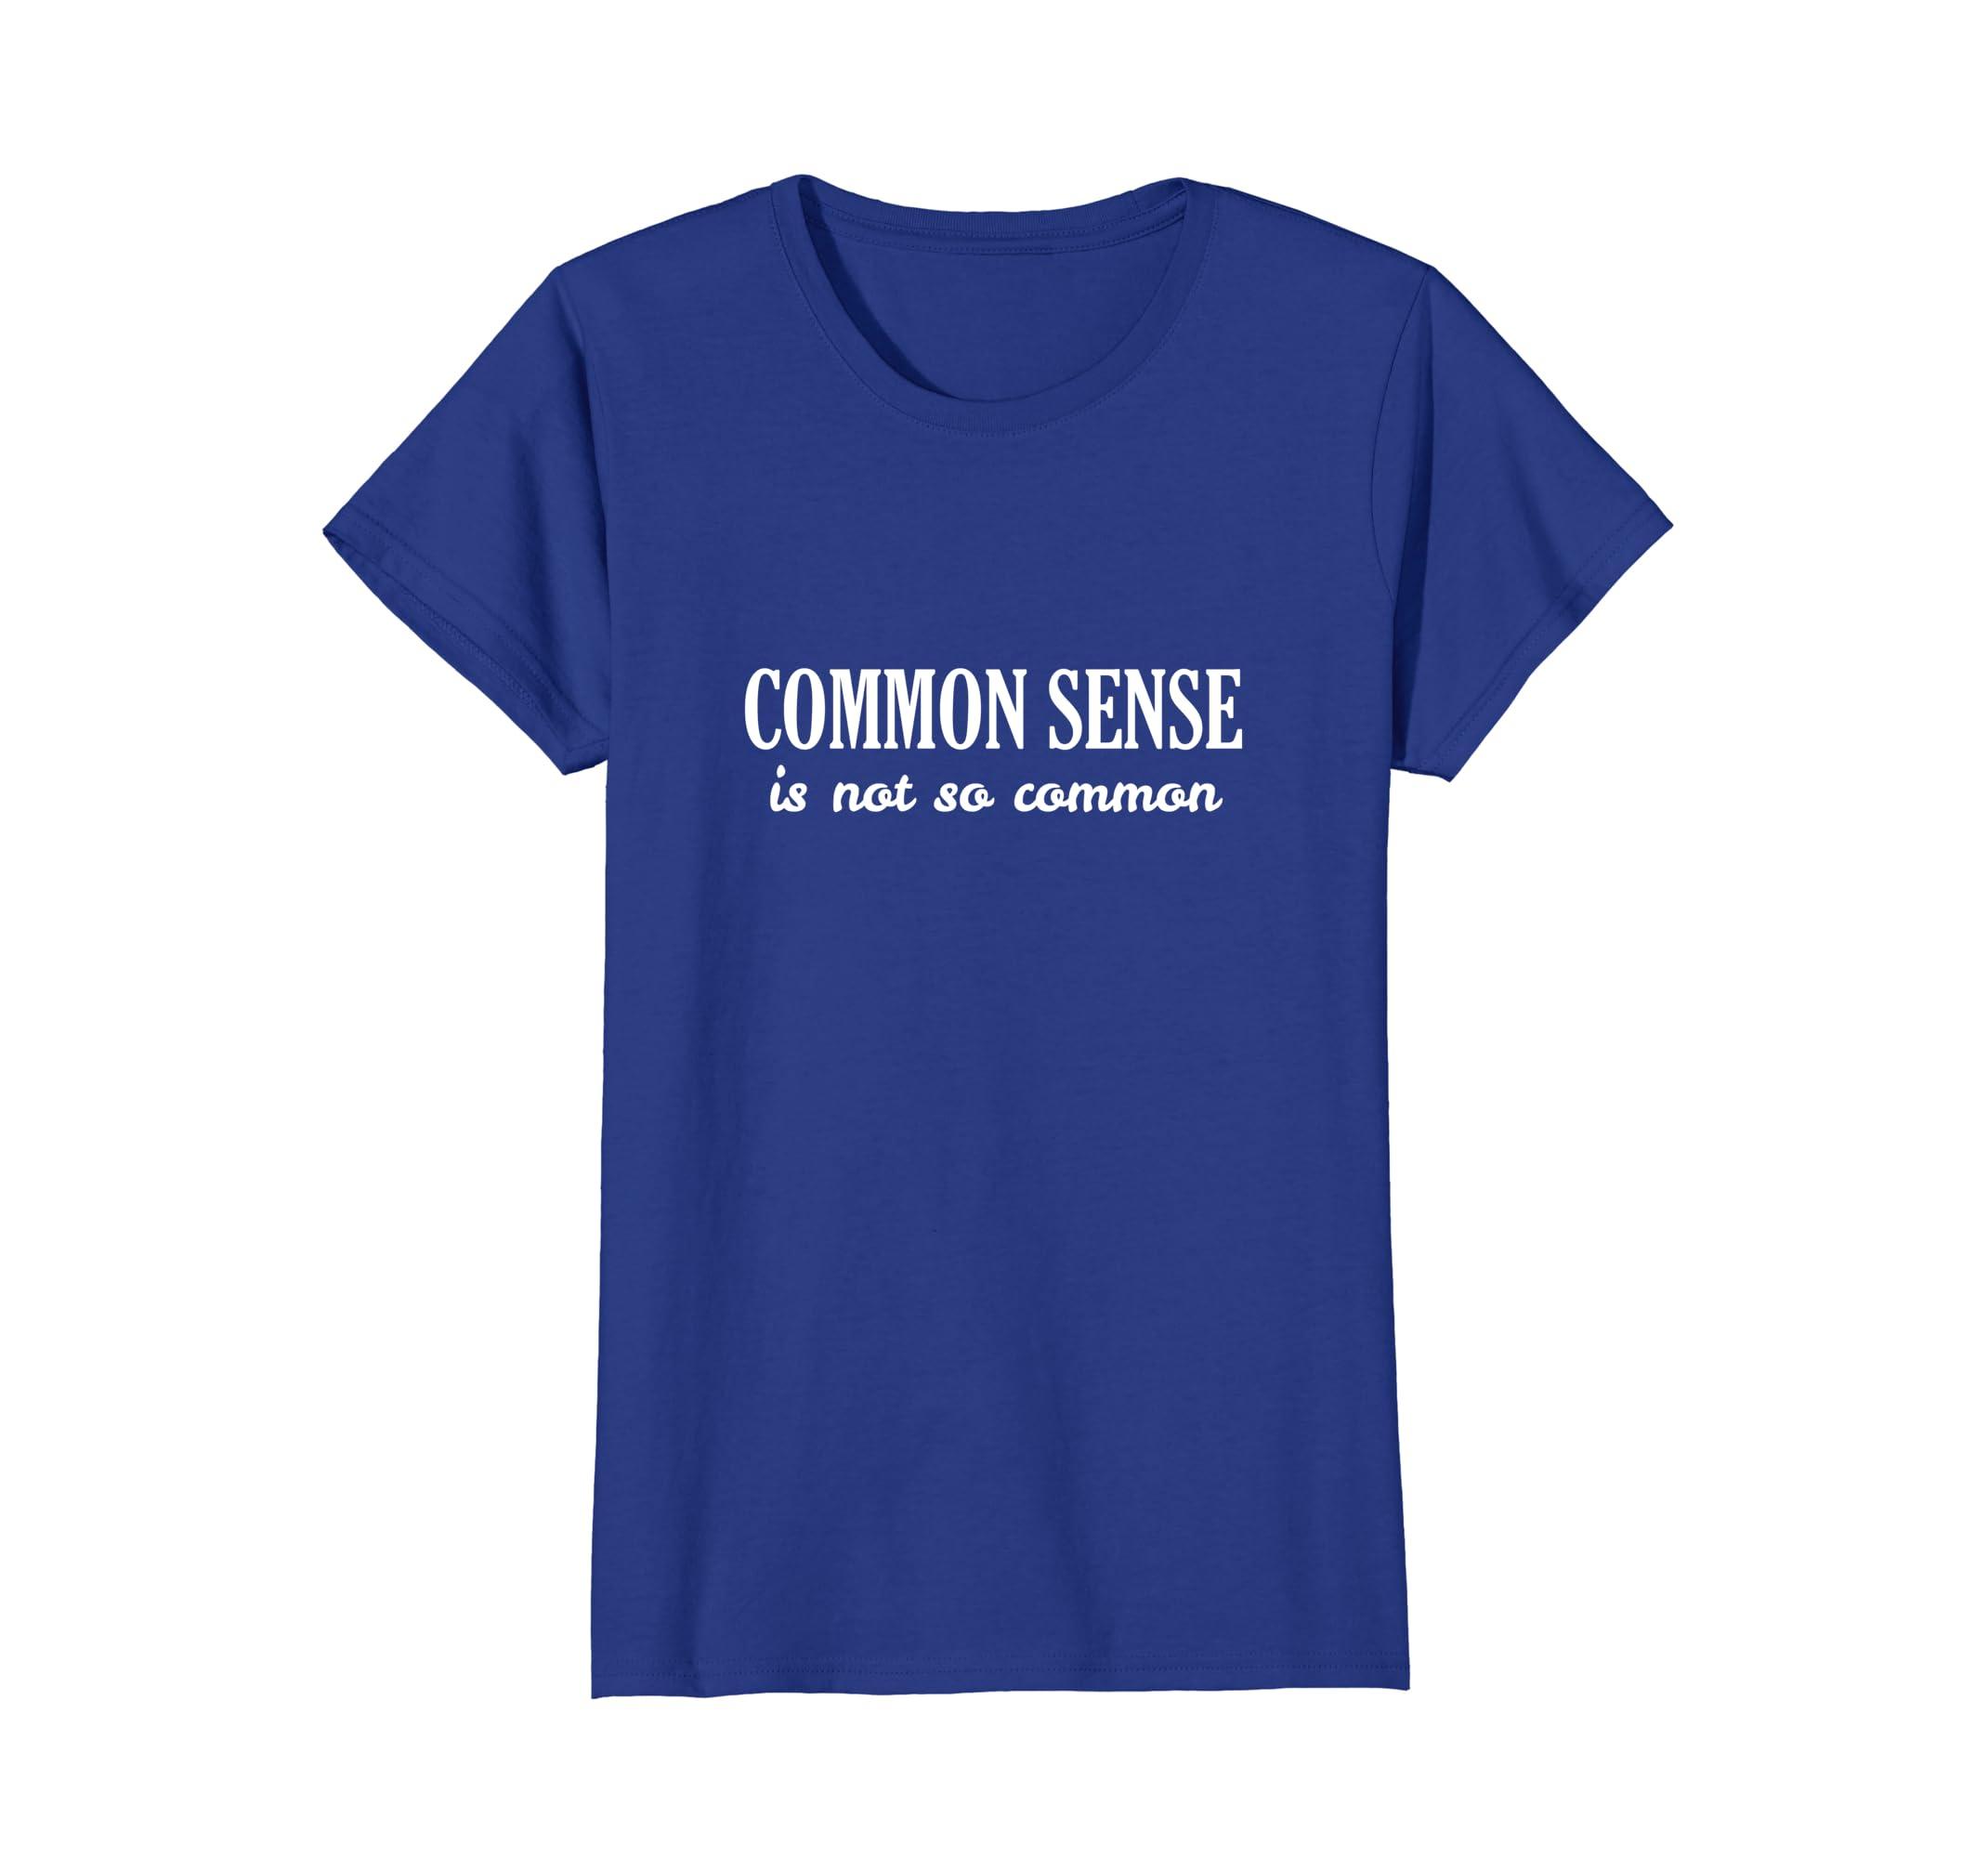 f399b5a0906 Amazon.com  Common sense is not so common T-Shirt  Clothing